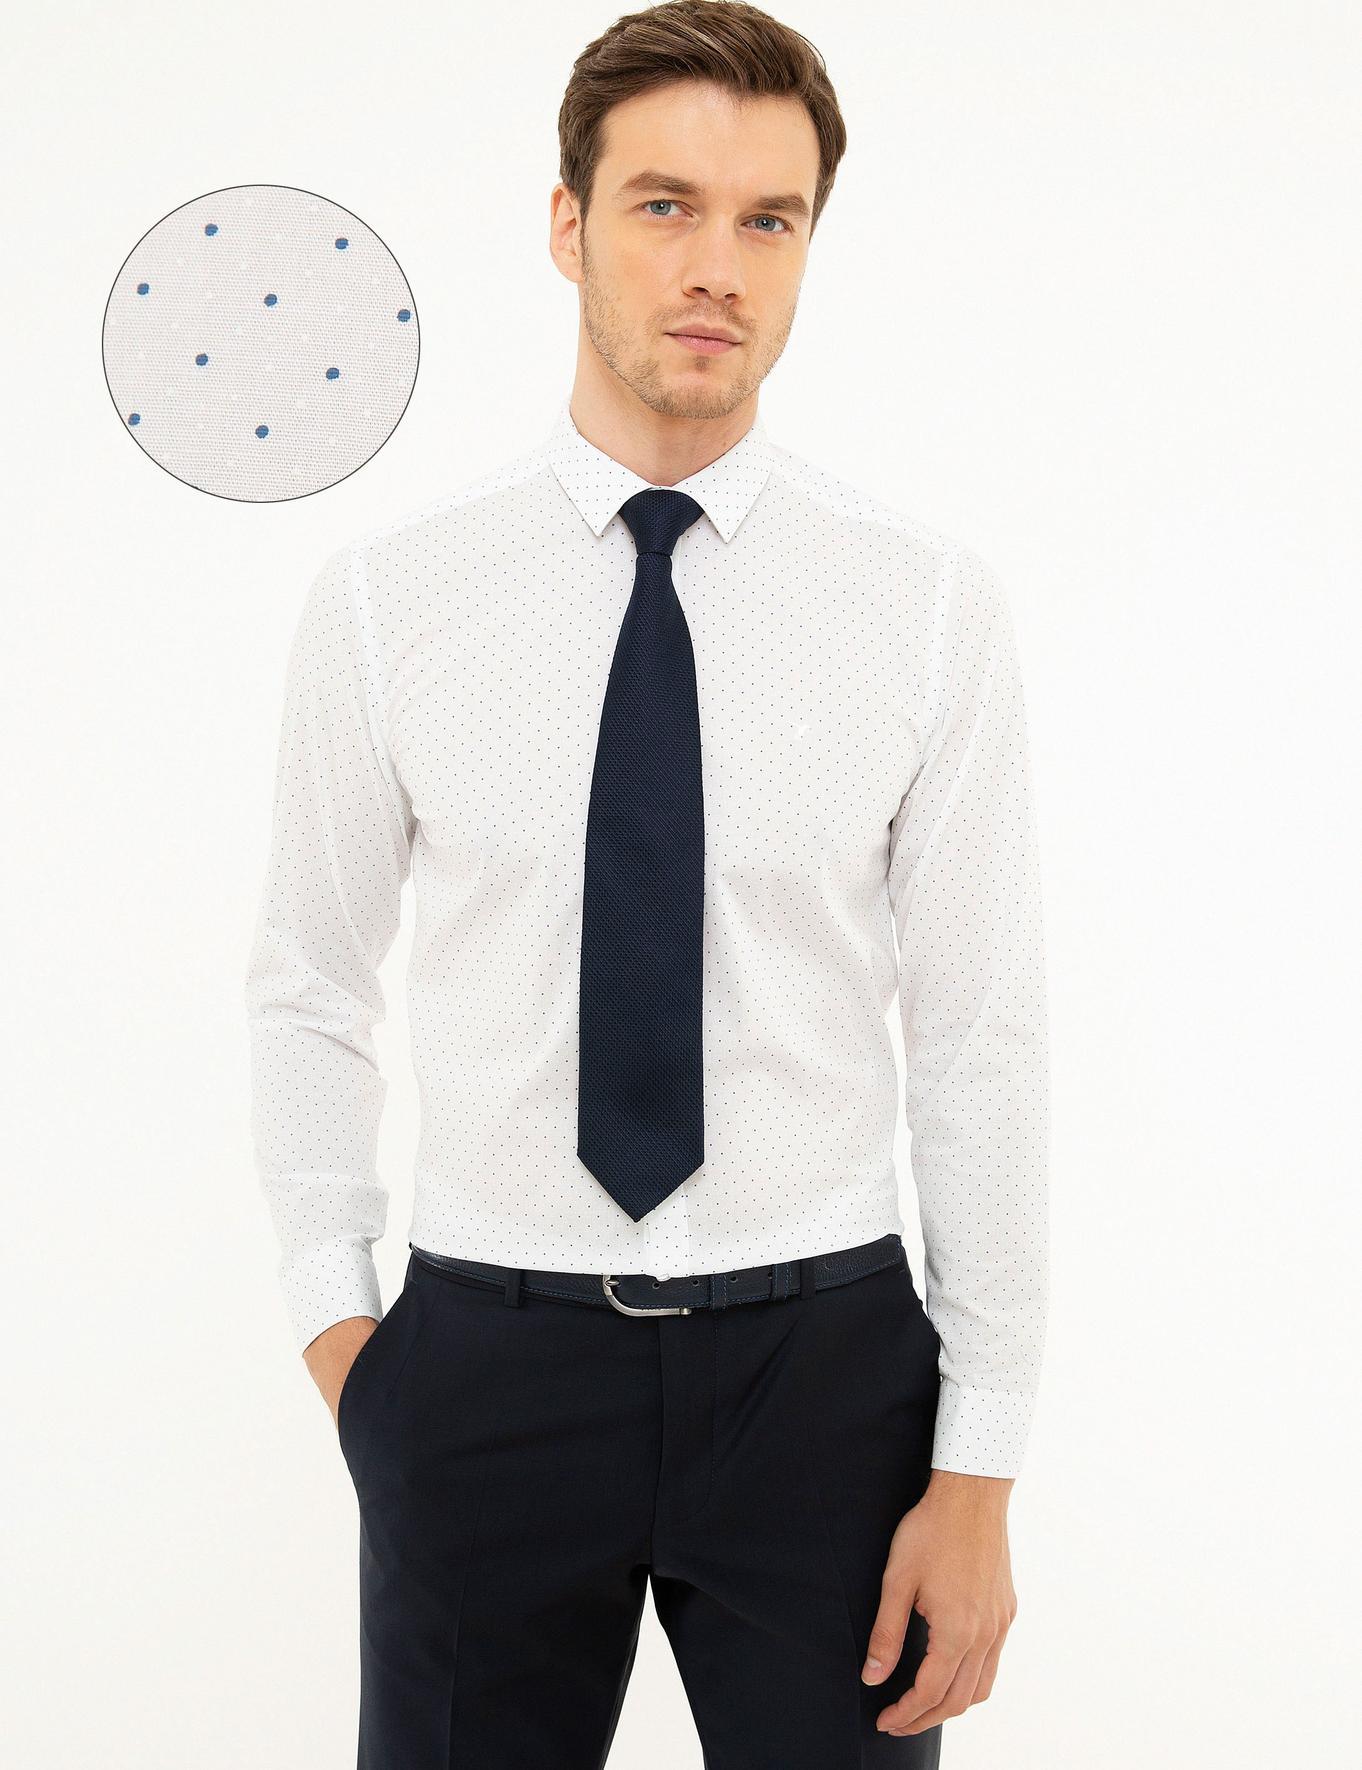 Beyaz Slim Fit Gömlek - 50218029007